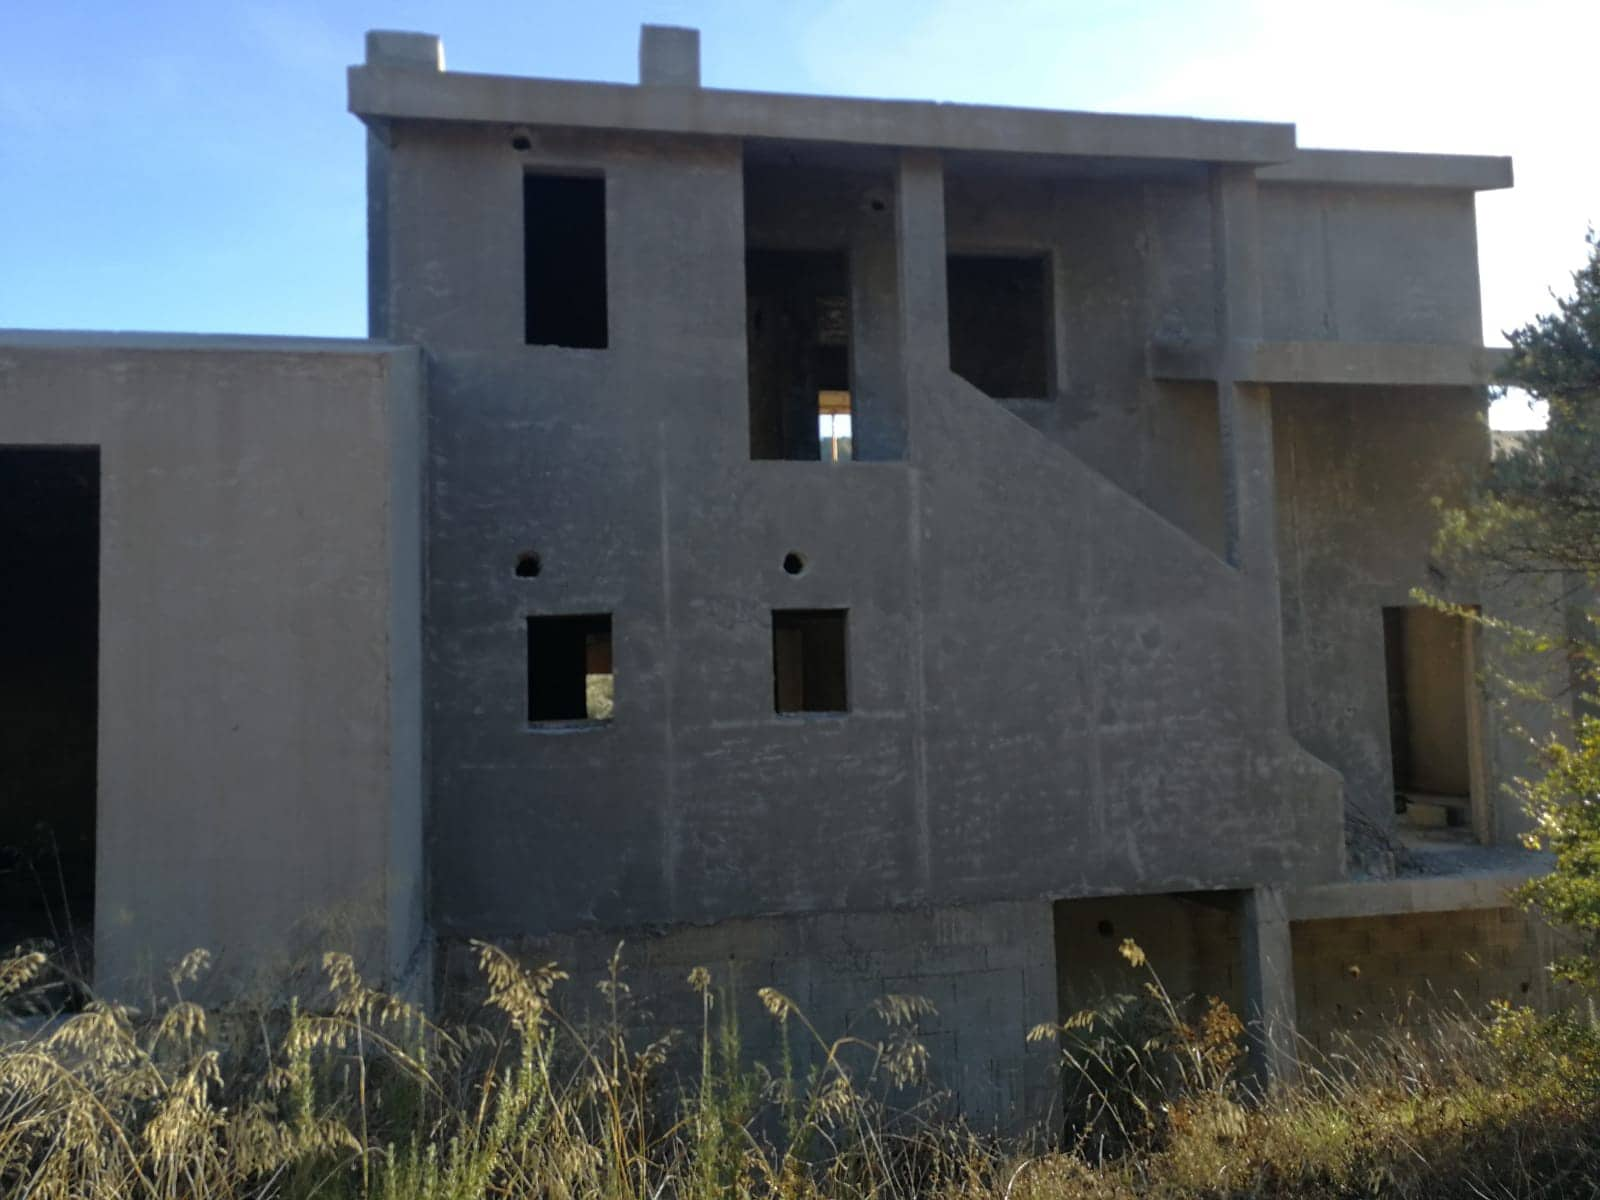 4 bedroom Finca/Country House for sale in Cretas - € 99,000 (Ref: 4110551)